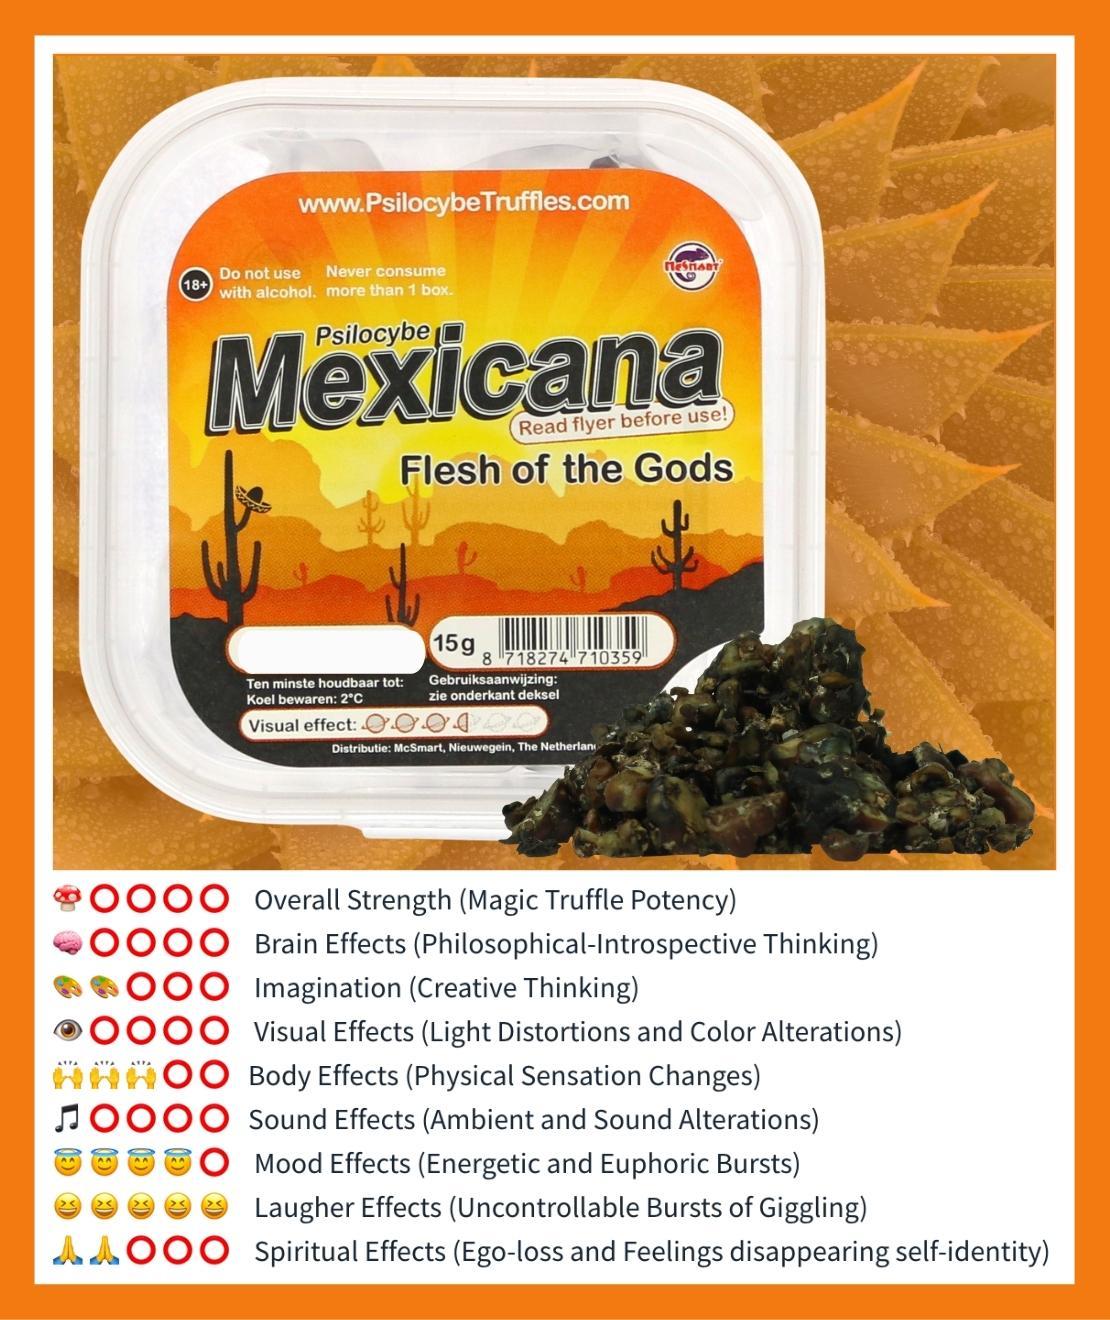 Mexicana Magic Truffles strength chart